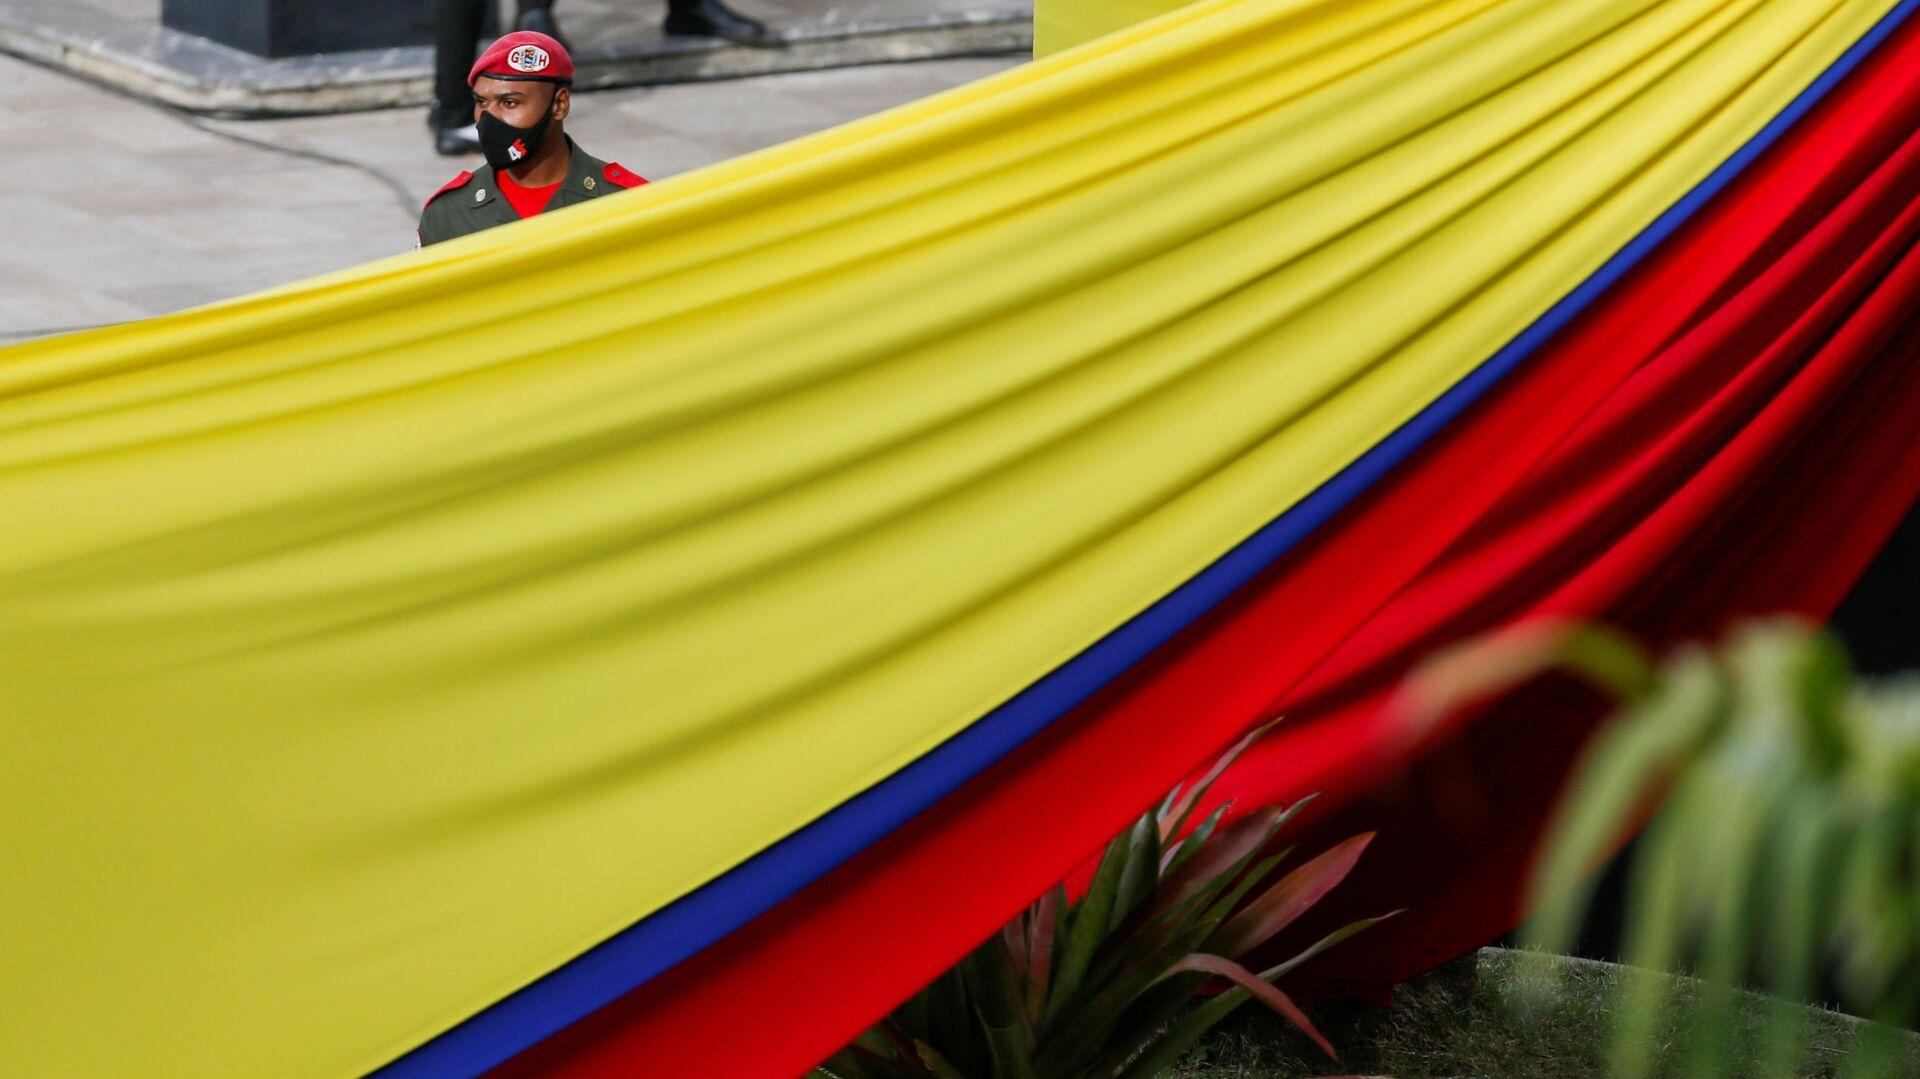 Bandera de Venezuela - Sputnik Mundo, 1920, 13.08.2021